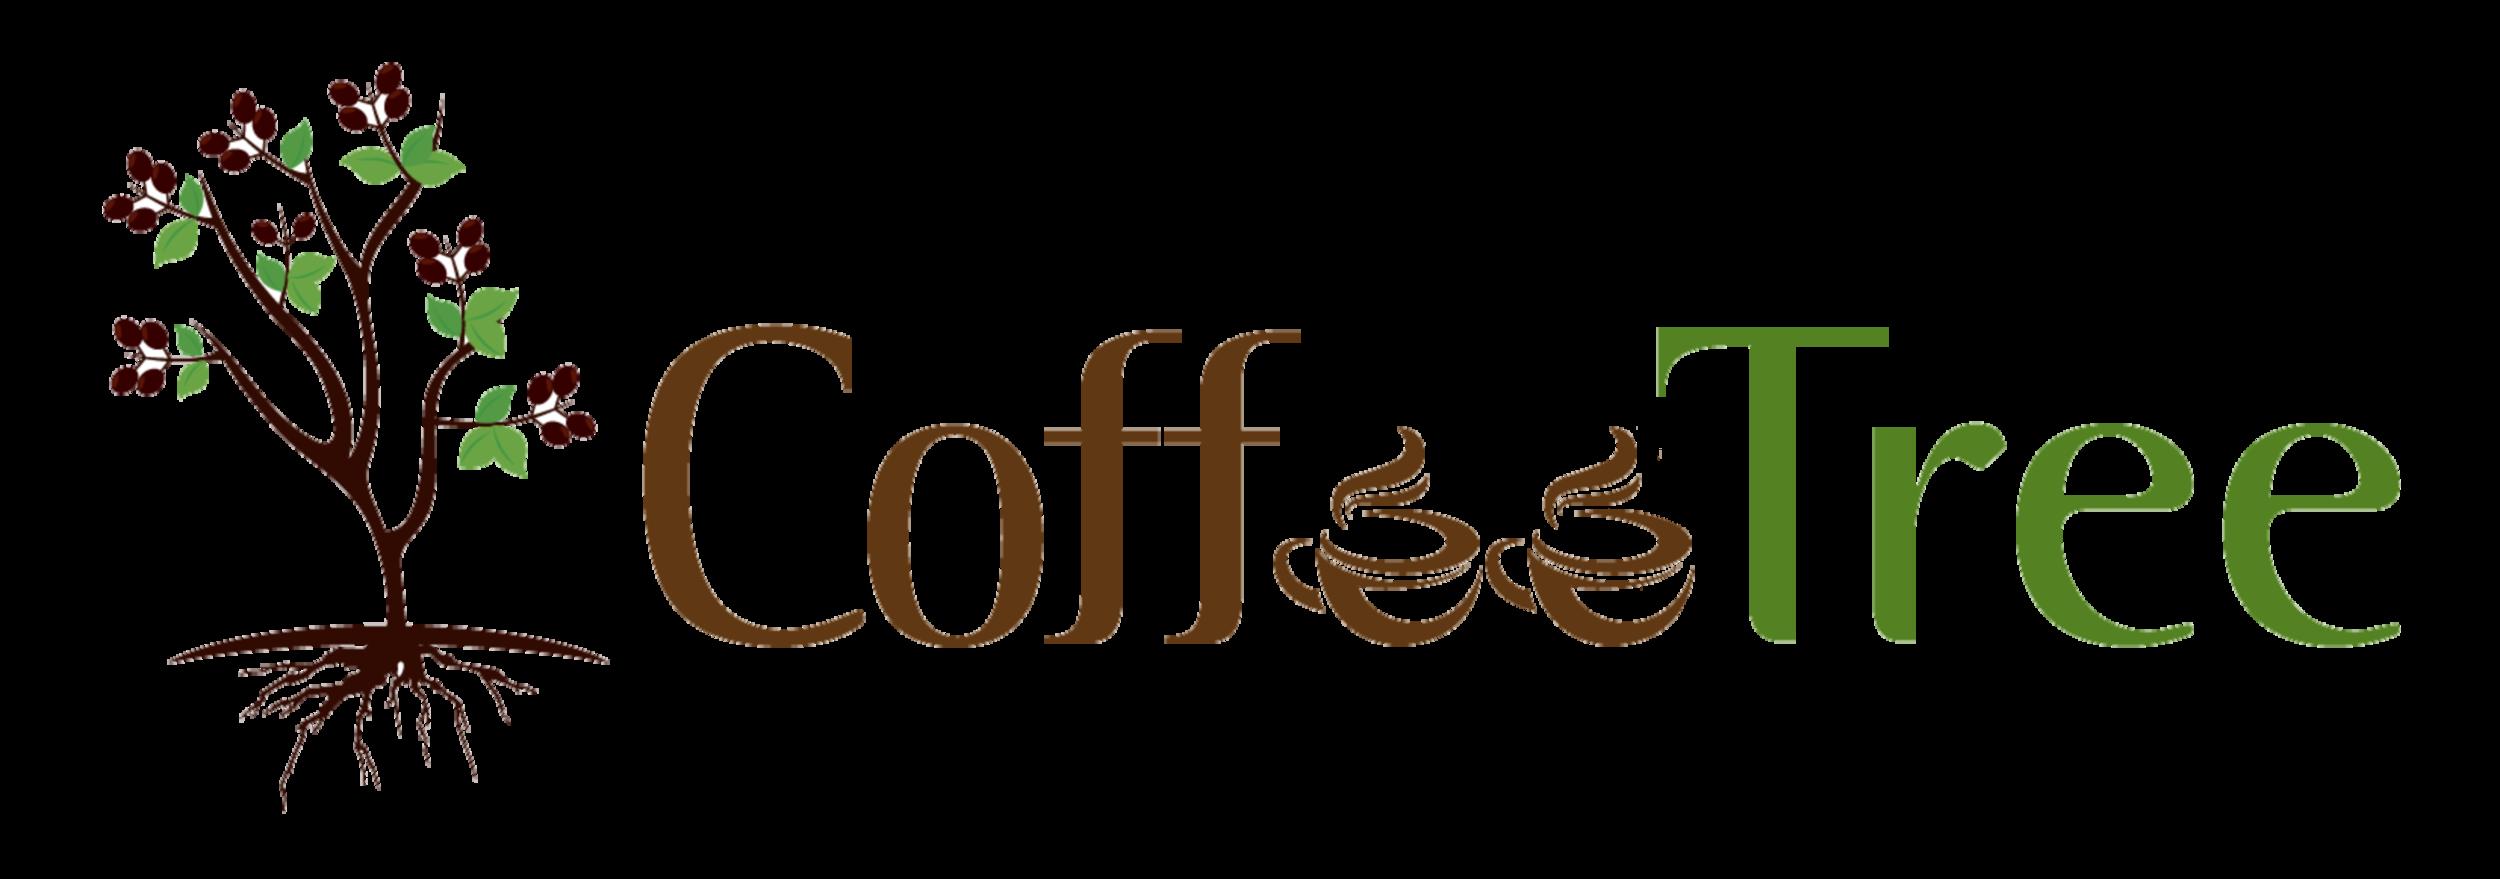 coffee tree logo.png